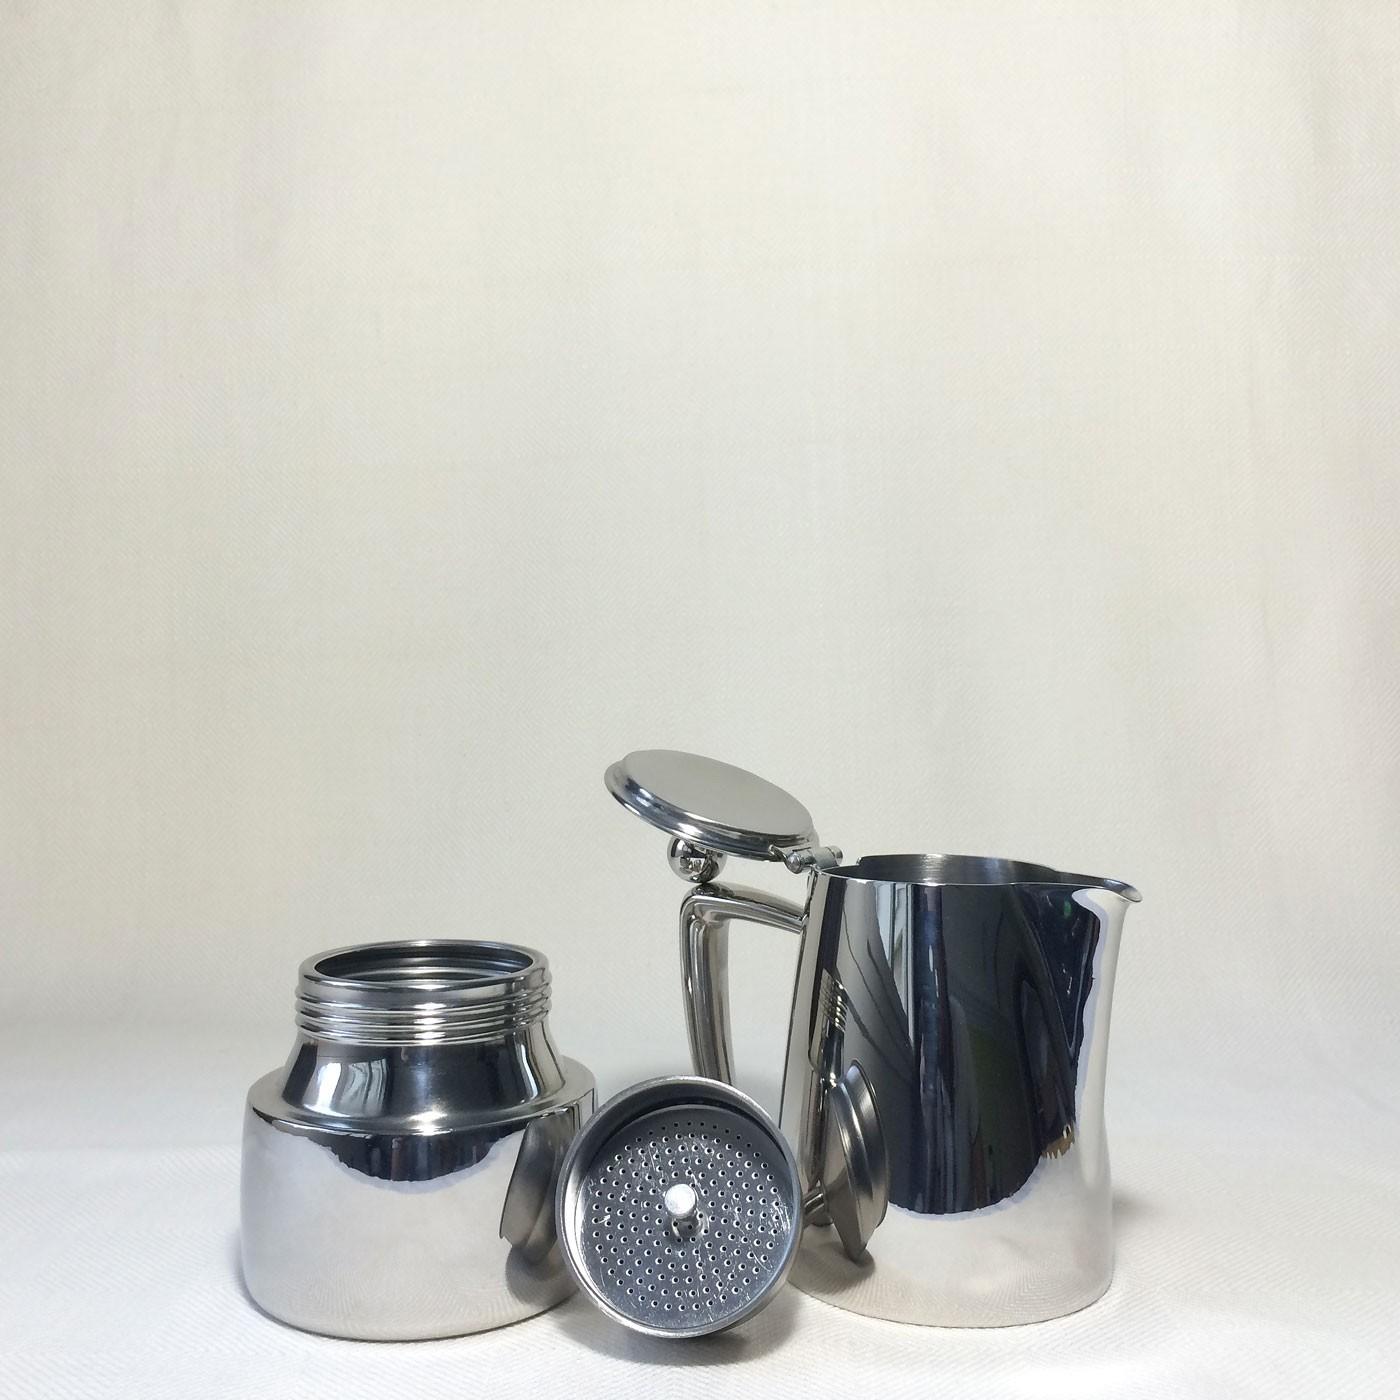 cafeti re espresso de luxe. Black Bedroom Furniture Sets. Home Design Ideas